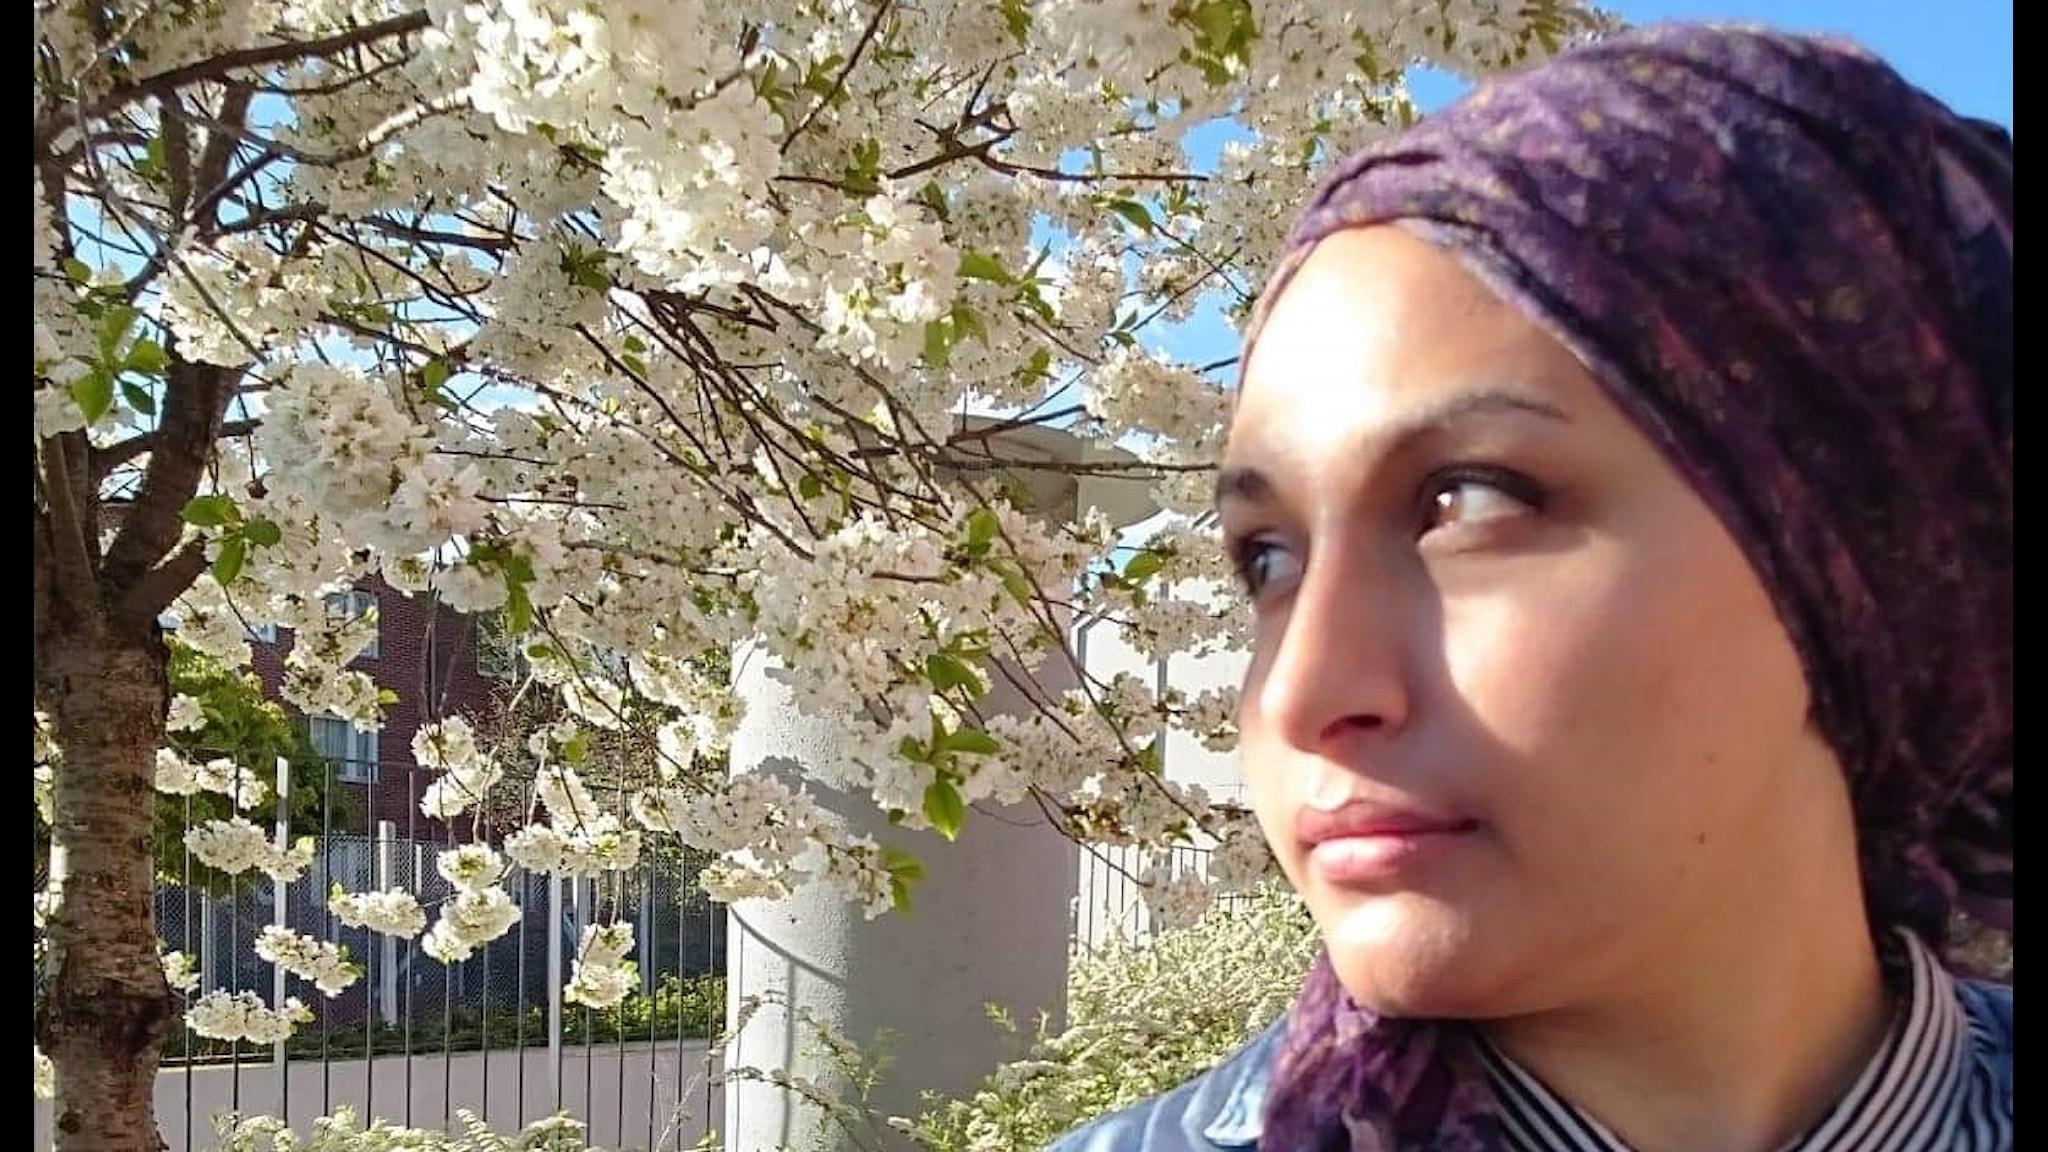 blommande träd, huvudduk